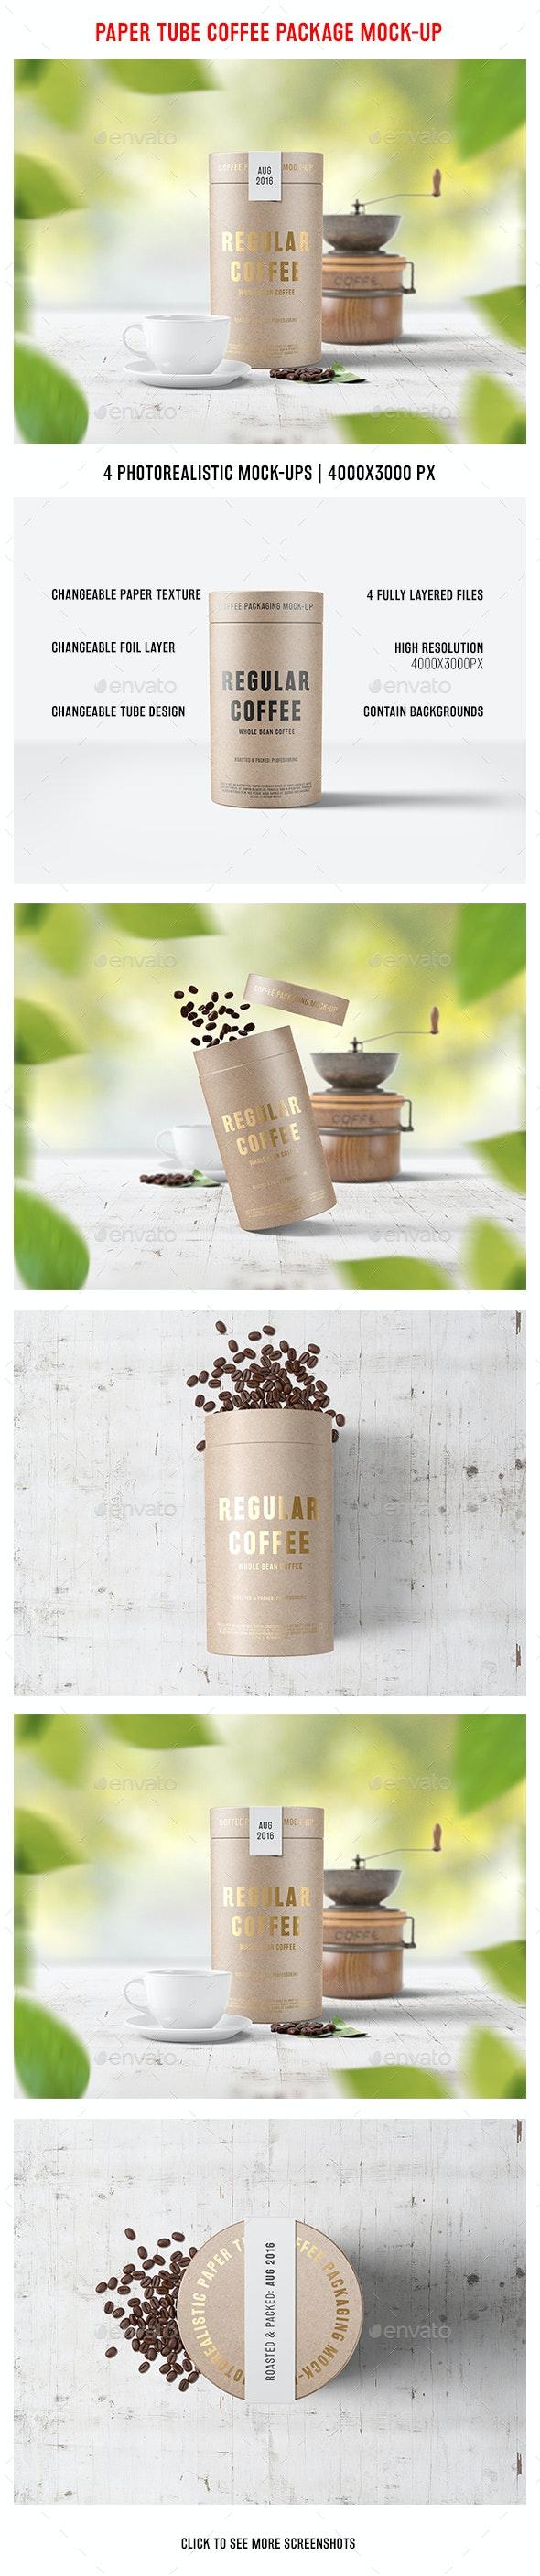 Paper Tube Coffee Package Mock-Up - Food and Drink Packaging